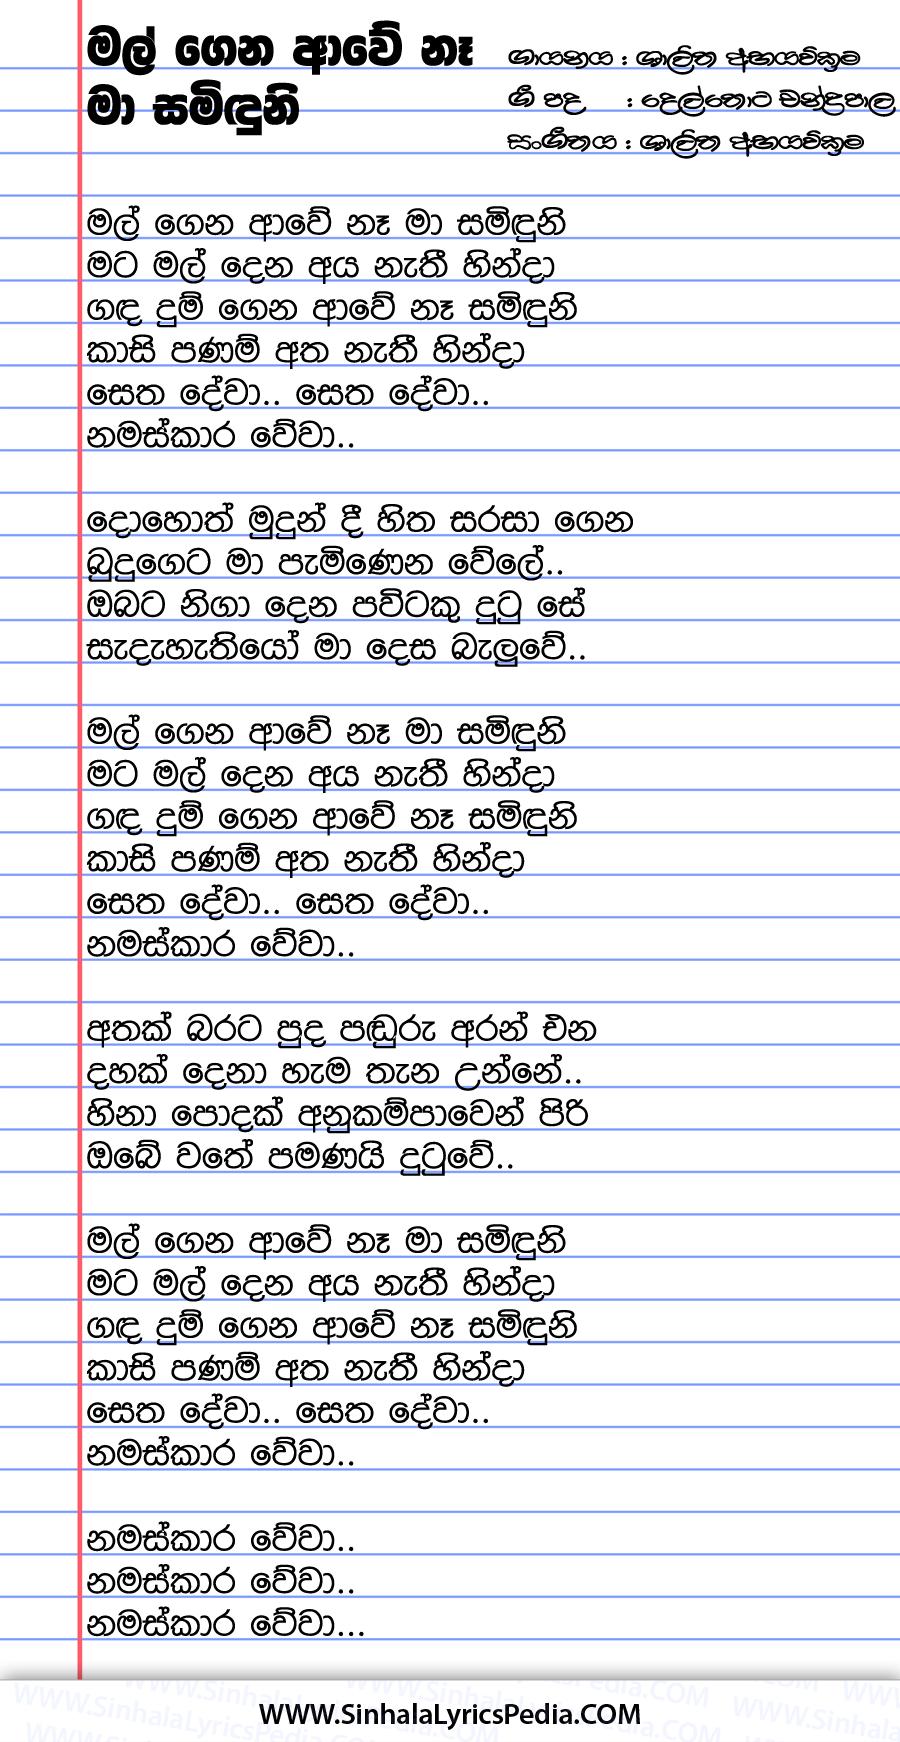 Mal Gena Awe Ne Ma Samiduni Song Lyrics